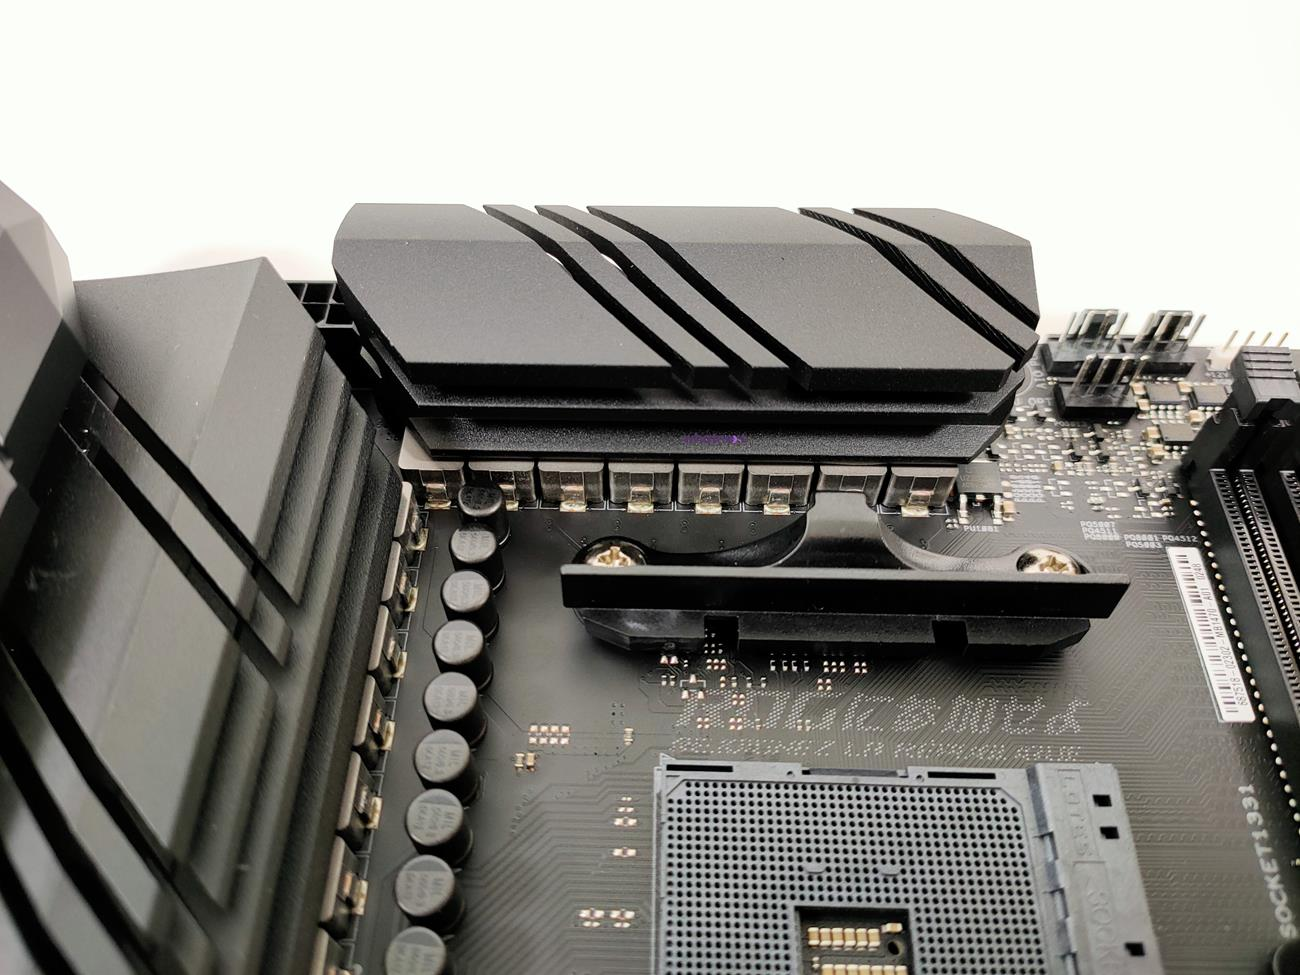 test Asus ROG Strix B550-E Gaming, recenzja Asus ROG Strix B550-E Gaming, review Asus ROG Strix B550-E Gaming, opinia Asus ROG Strix B550-E Gaming